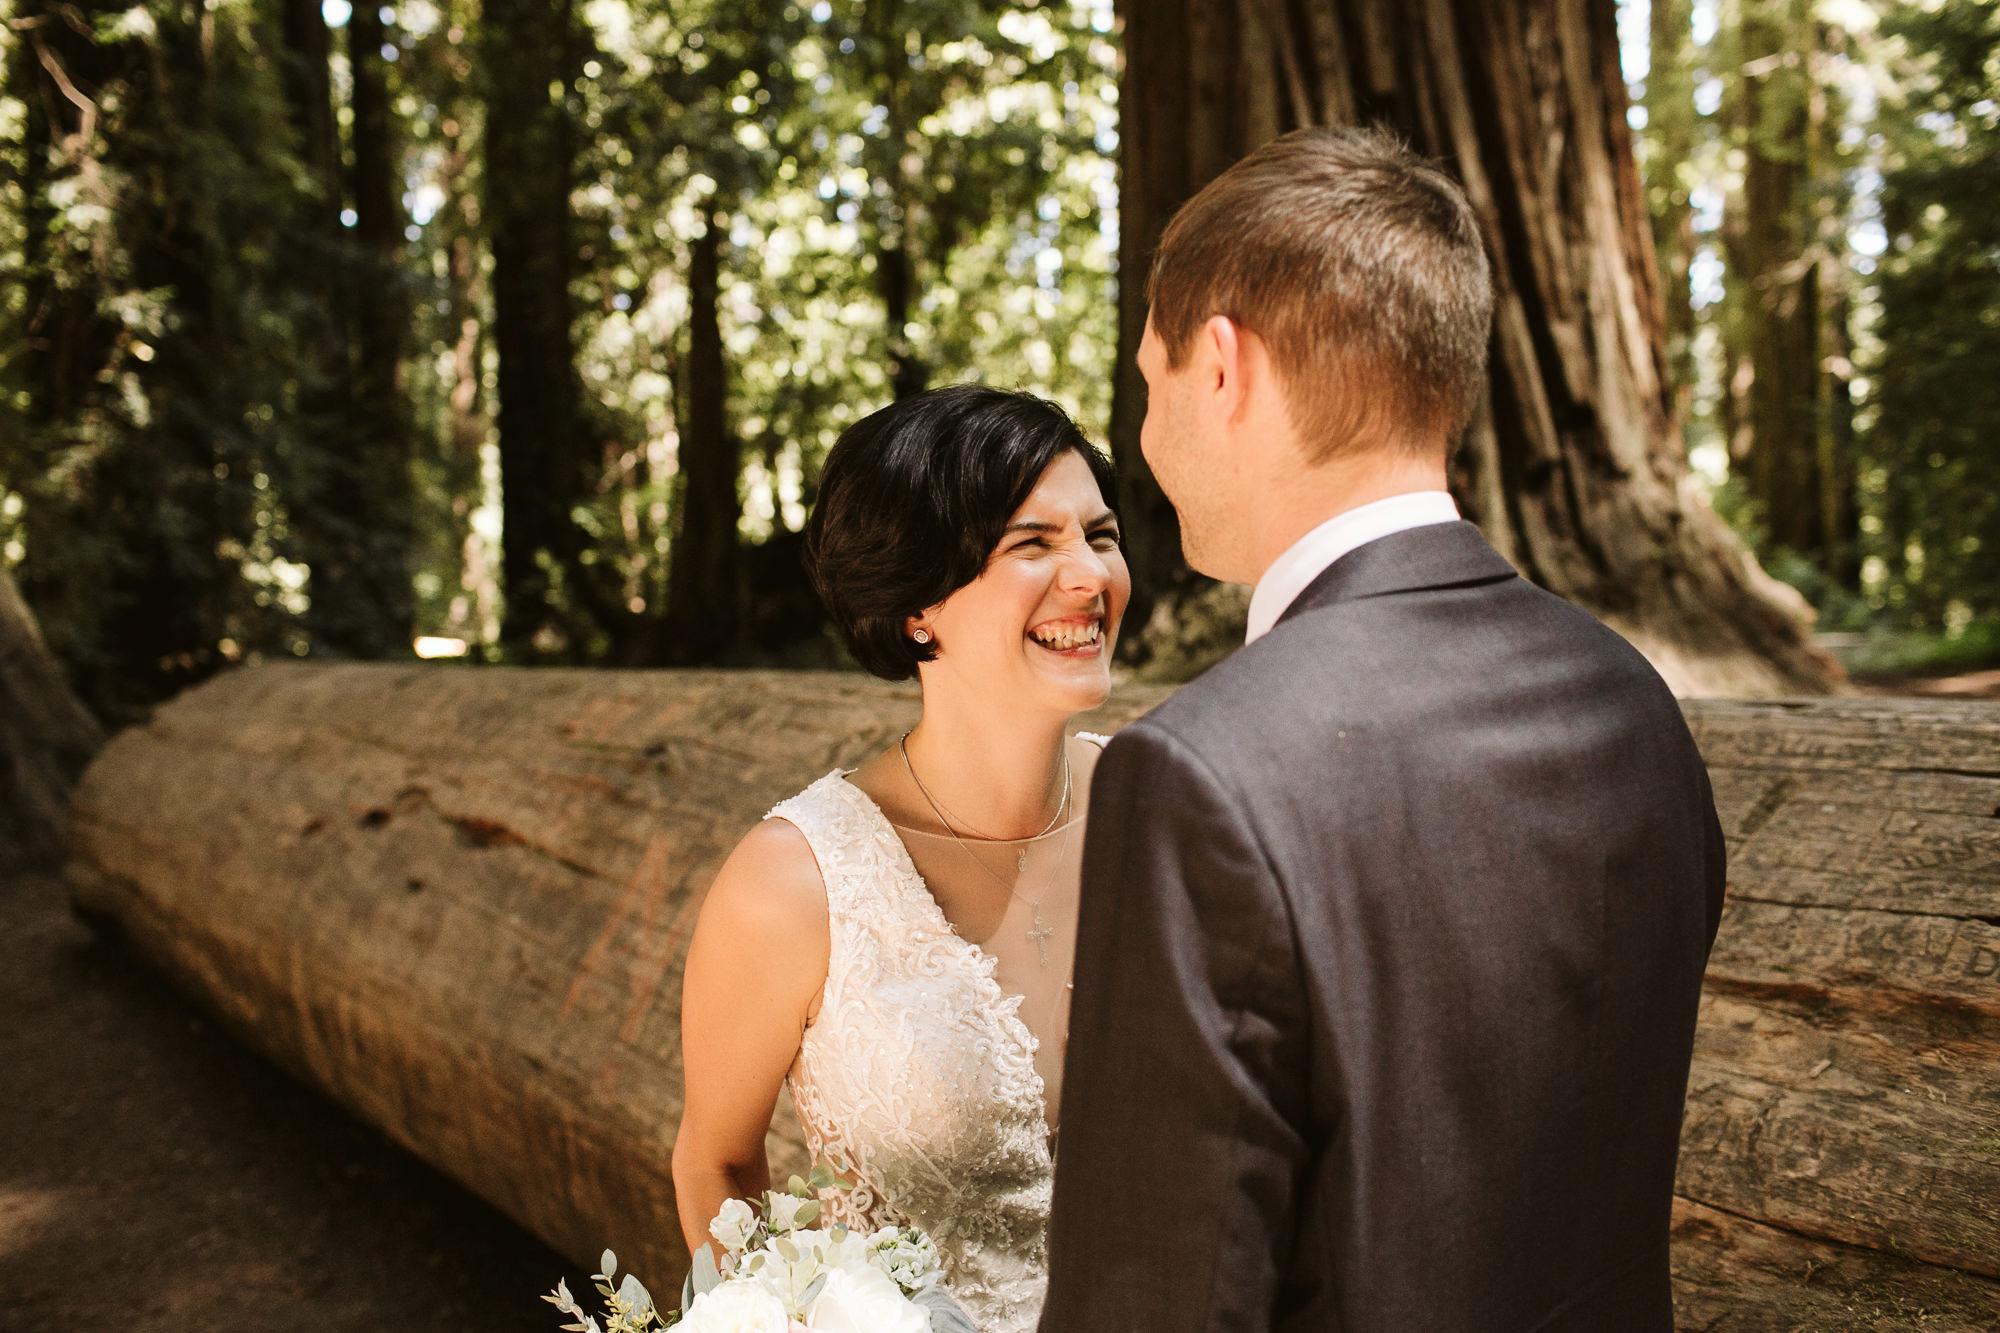 California-wedding-photographer-alfonso-flores-pamplin-groove-157.jpg